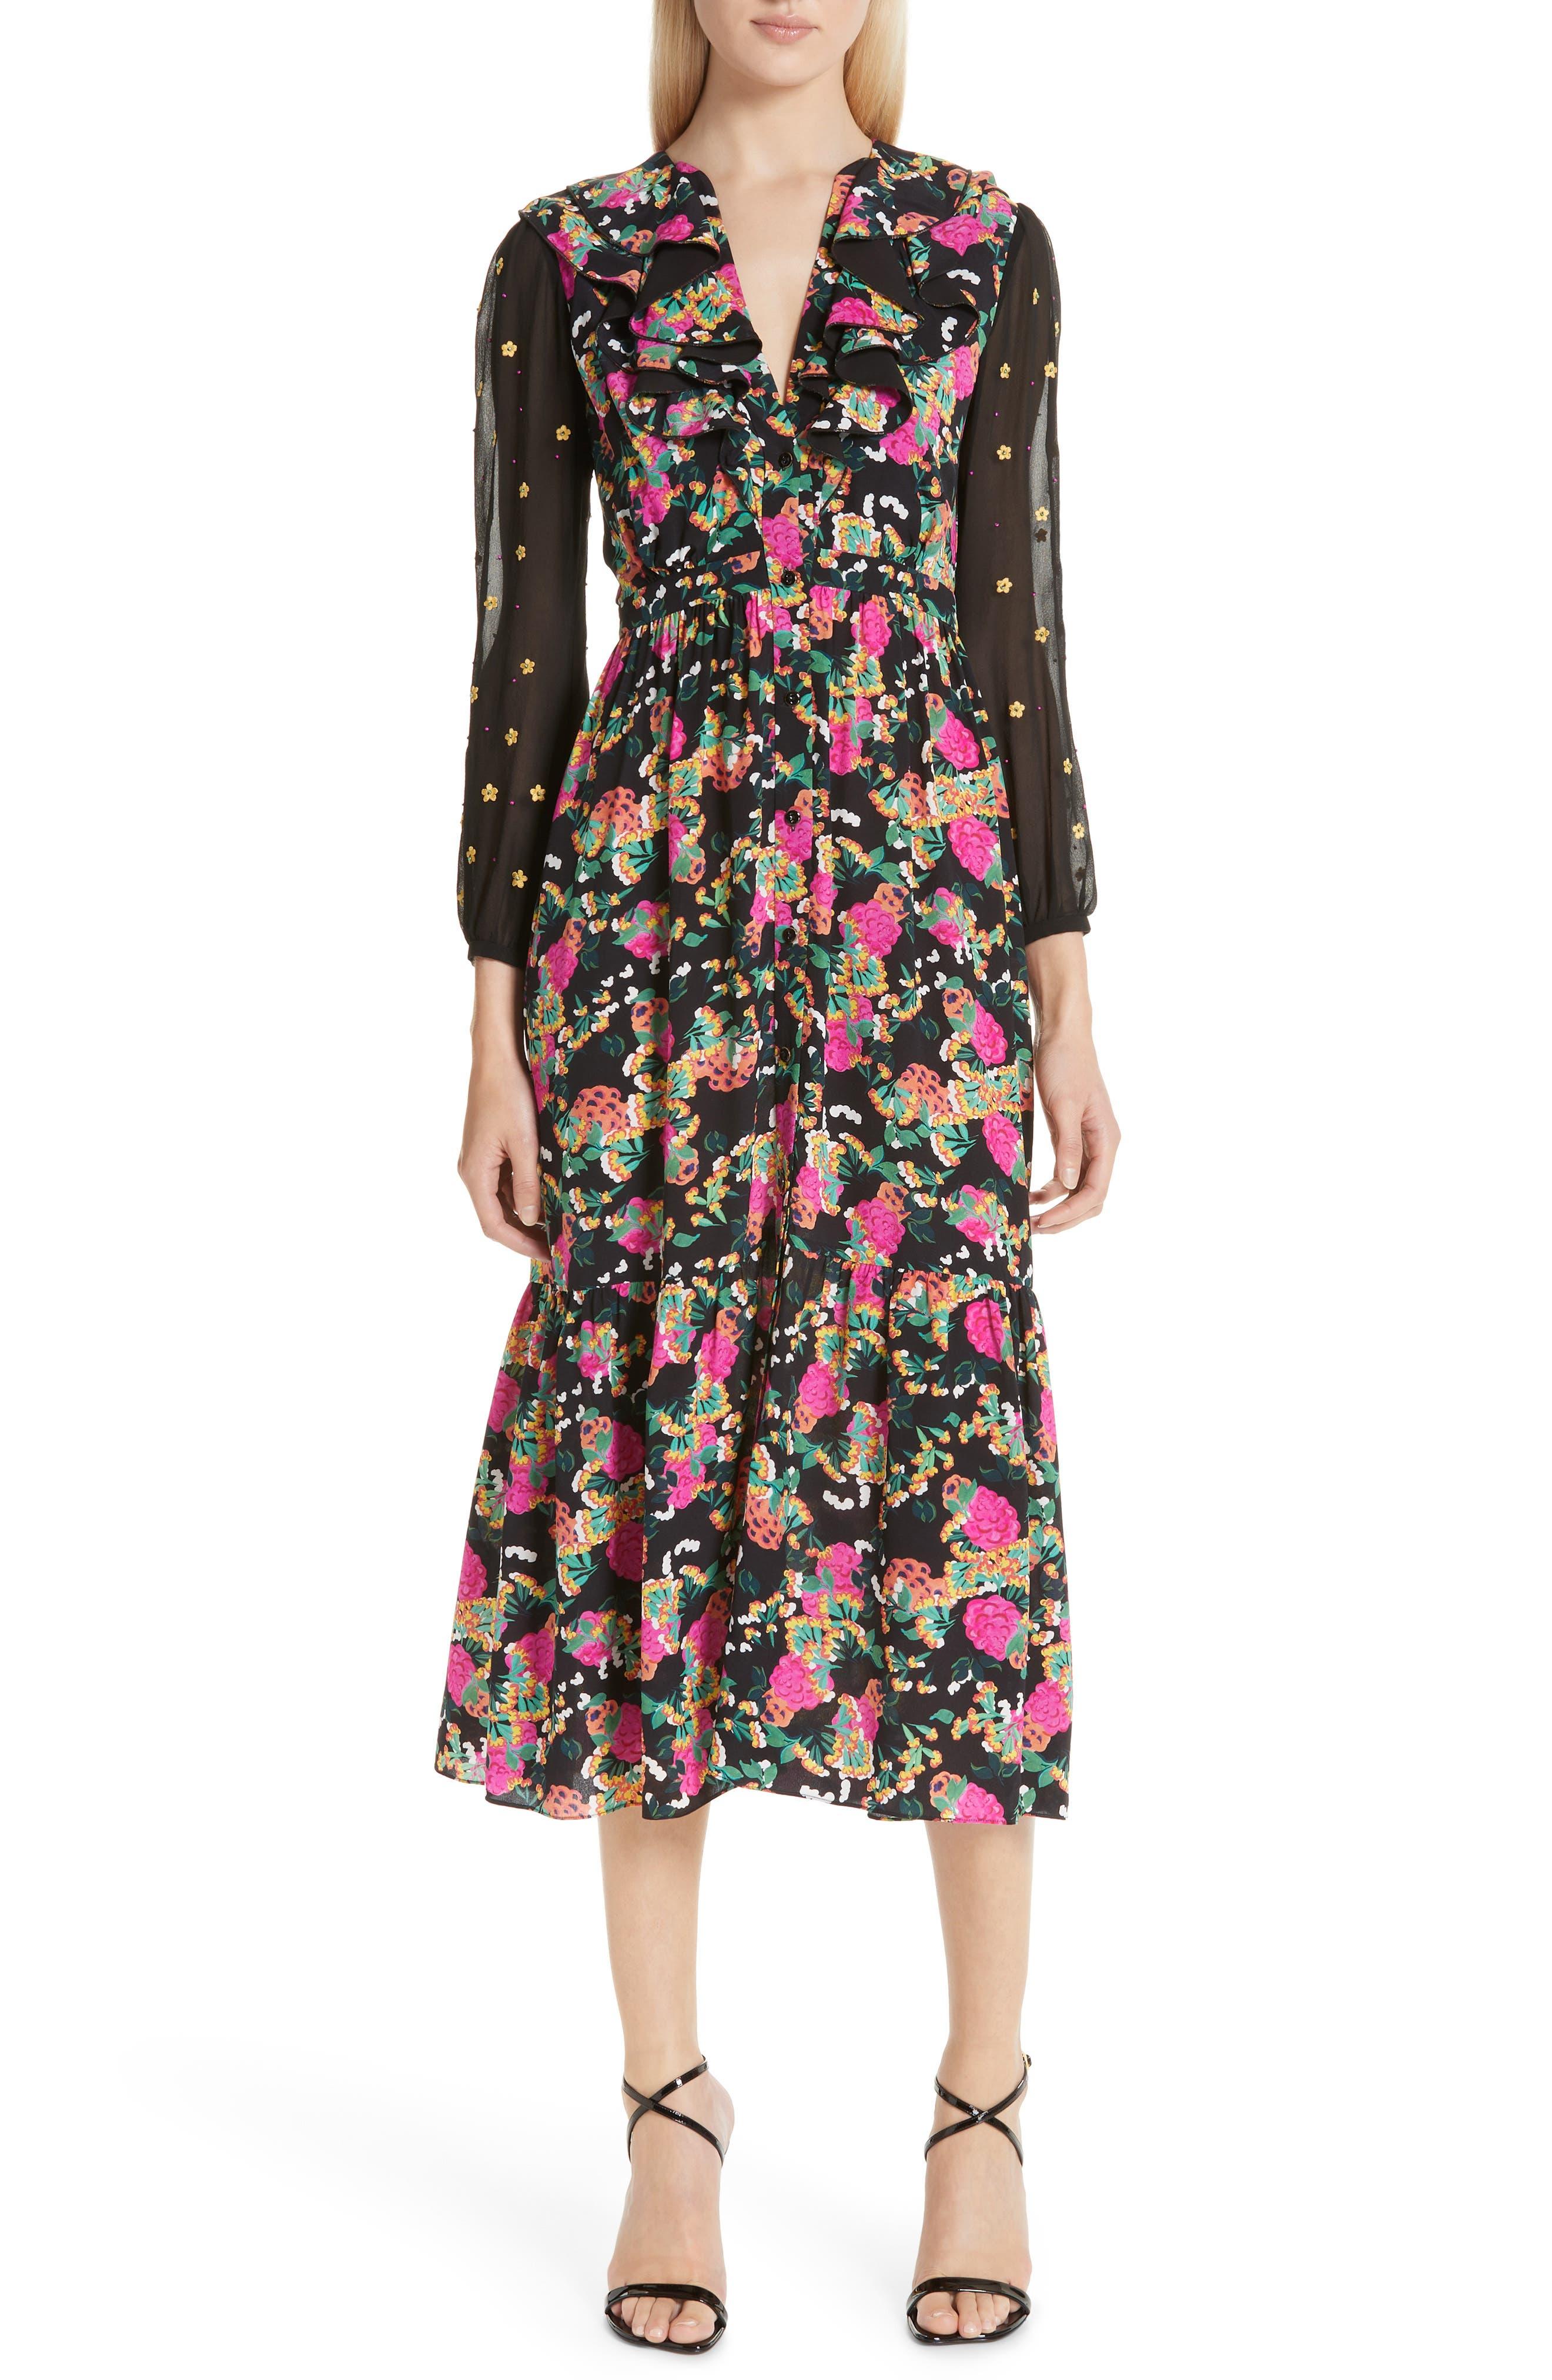 SALONI, Ginny Silk Midi Dress, Main thumbnail 1, color, HYDRANGEA/ EMBELLISHMENT